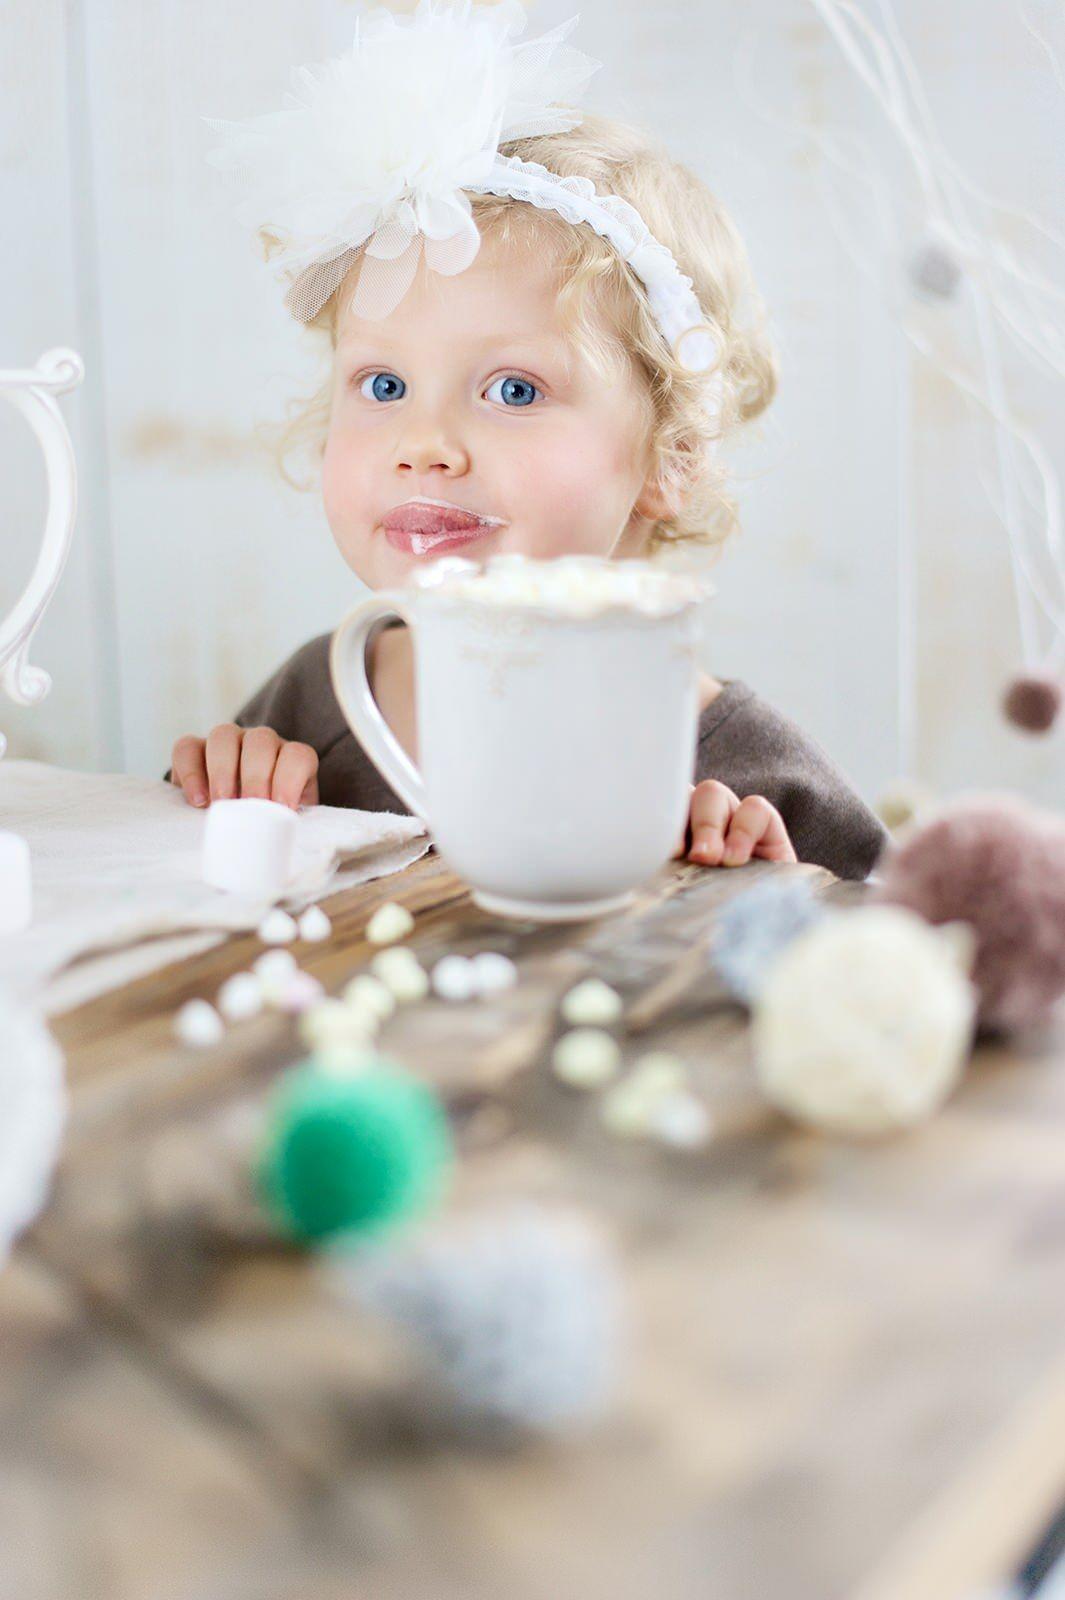 www.photoblu.se  Natalja Golubova photography  Kids and Family photographer located in Riga, Latvia